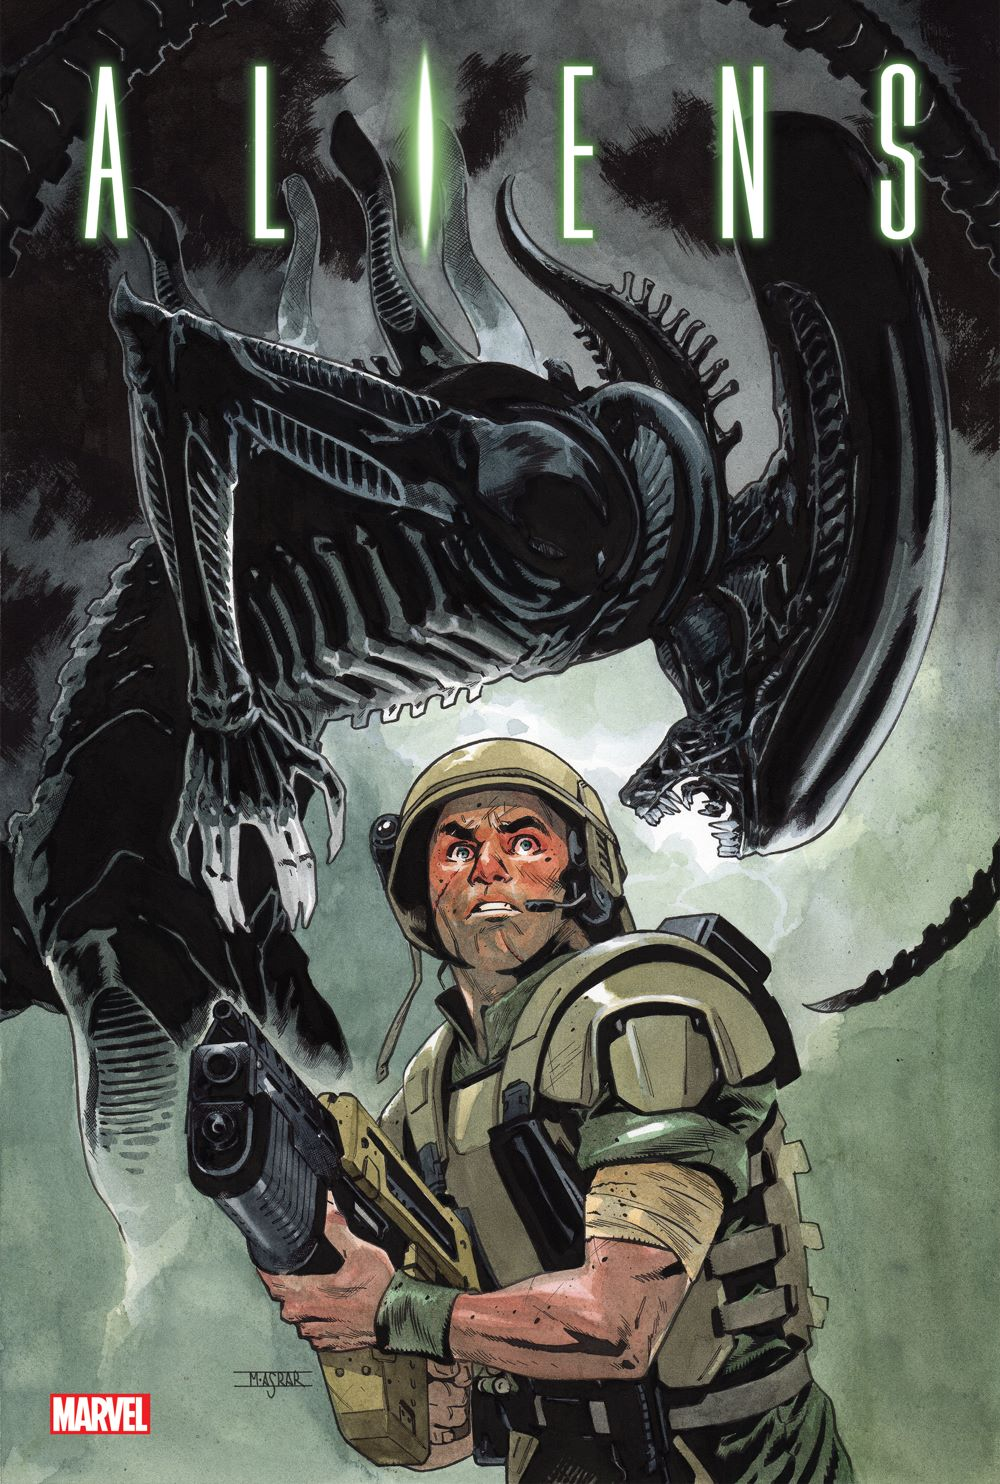 ALIENSOMNIV2HC_COV Discover more classic Alien stories in ALIENS: THE ORIGINAL YEARS OMNIBUS VOL. 2